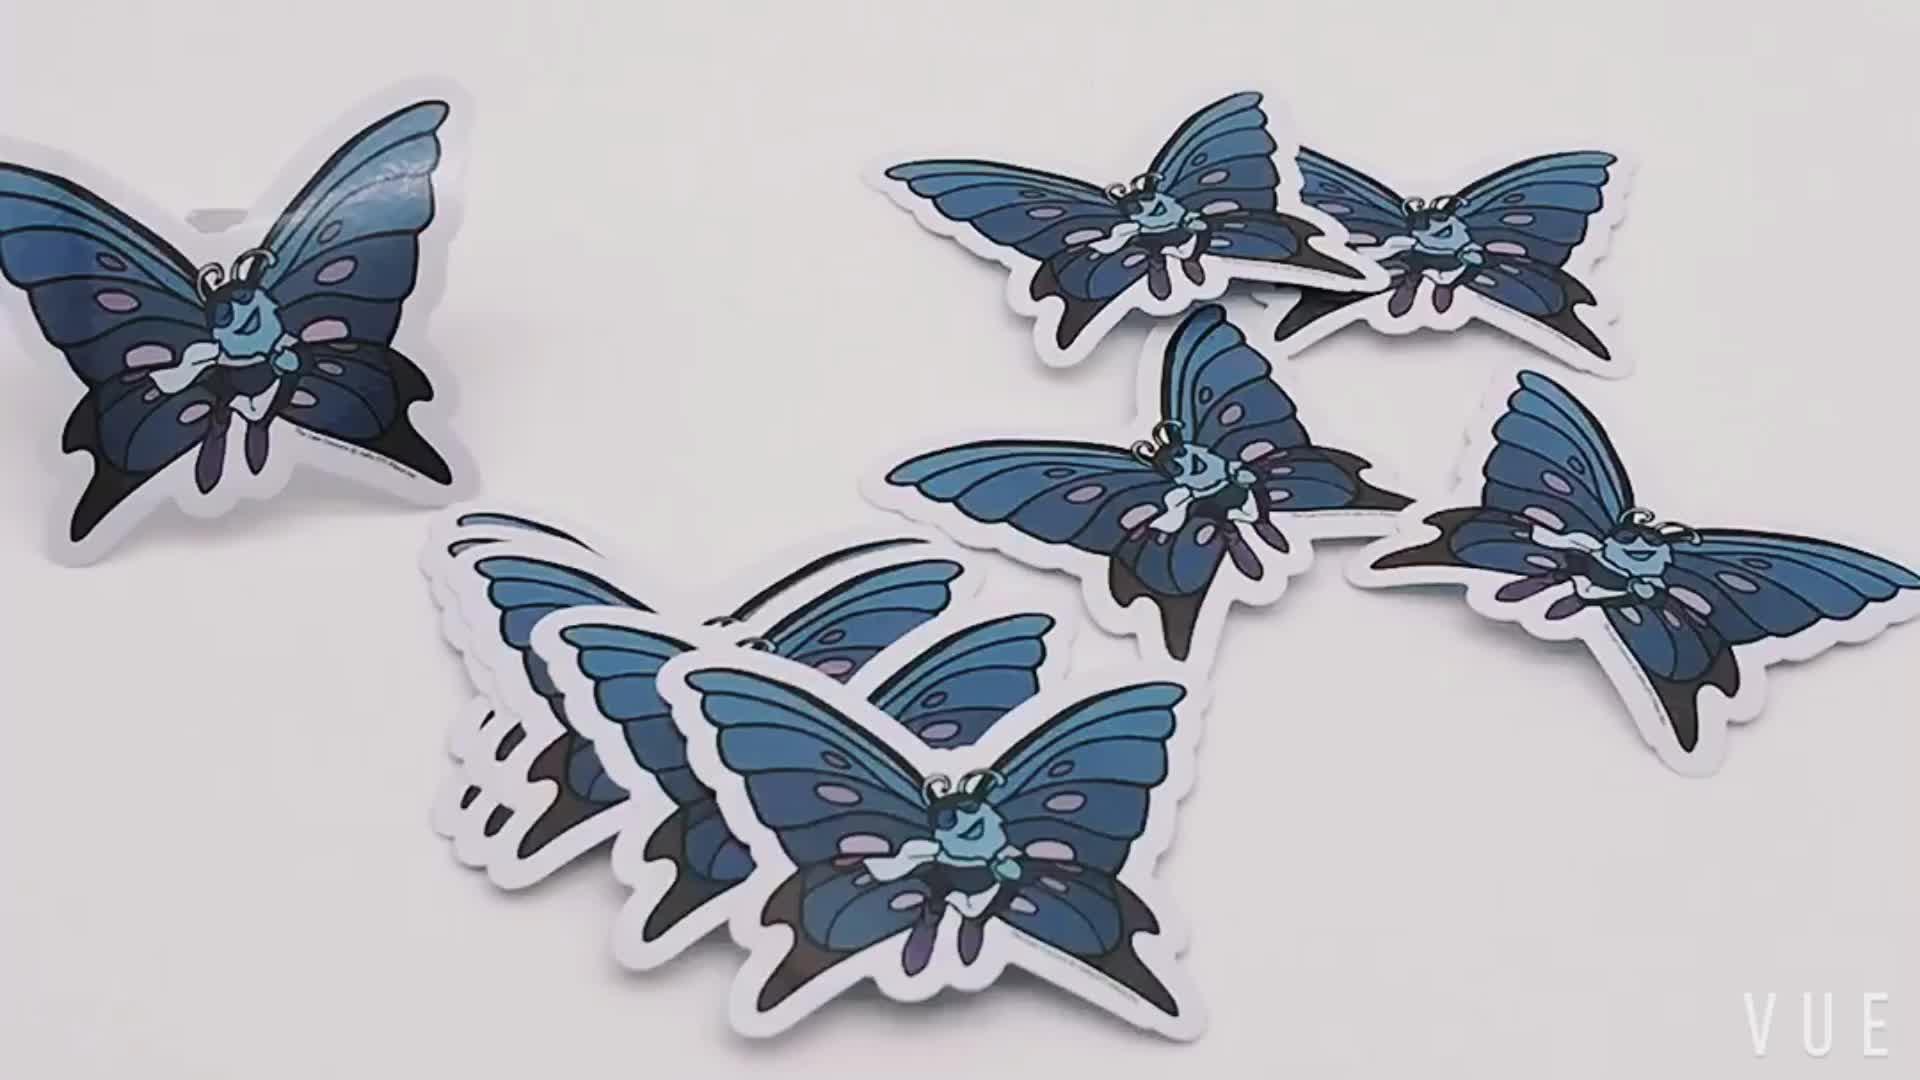 Custom Die Cut PVC Vinyl Business Sticker Label For Outdoor & Promotion